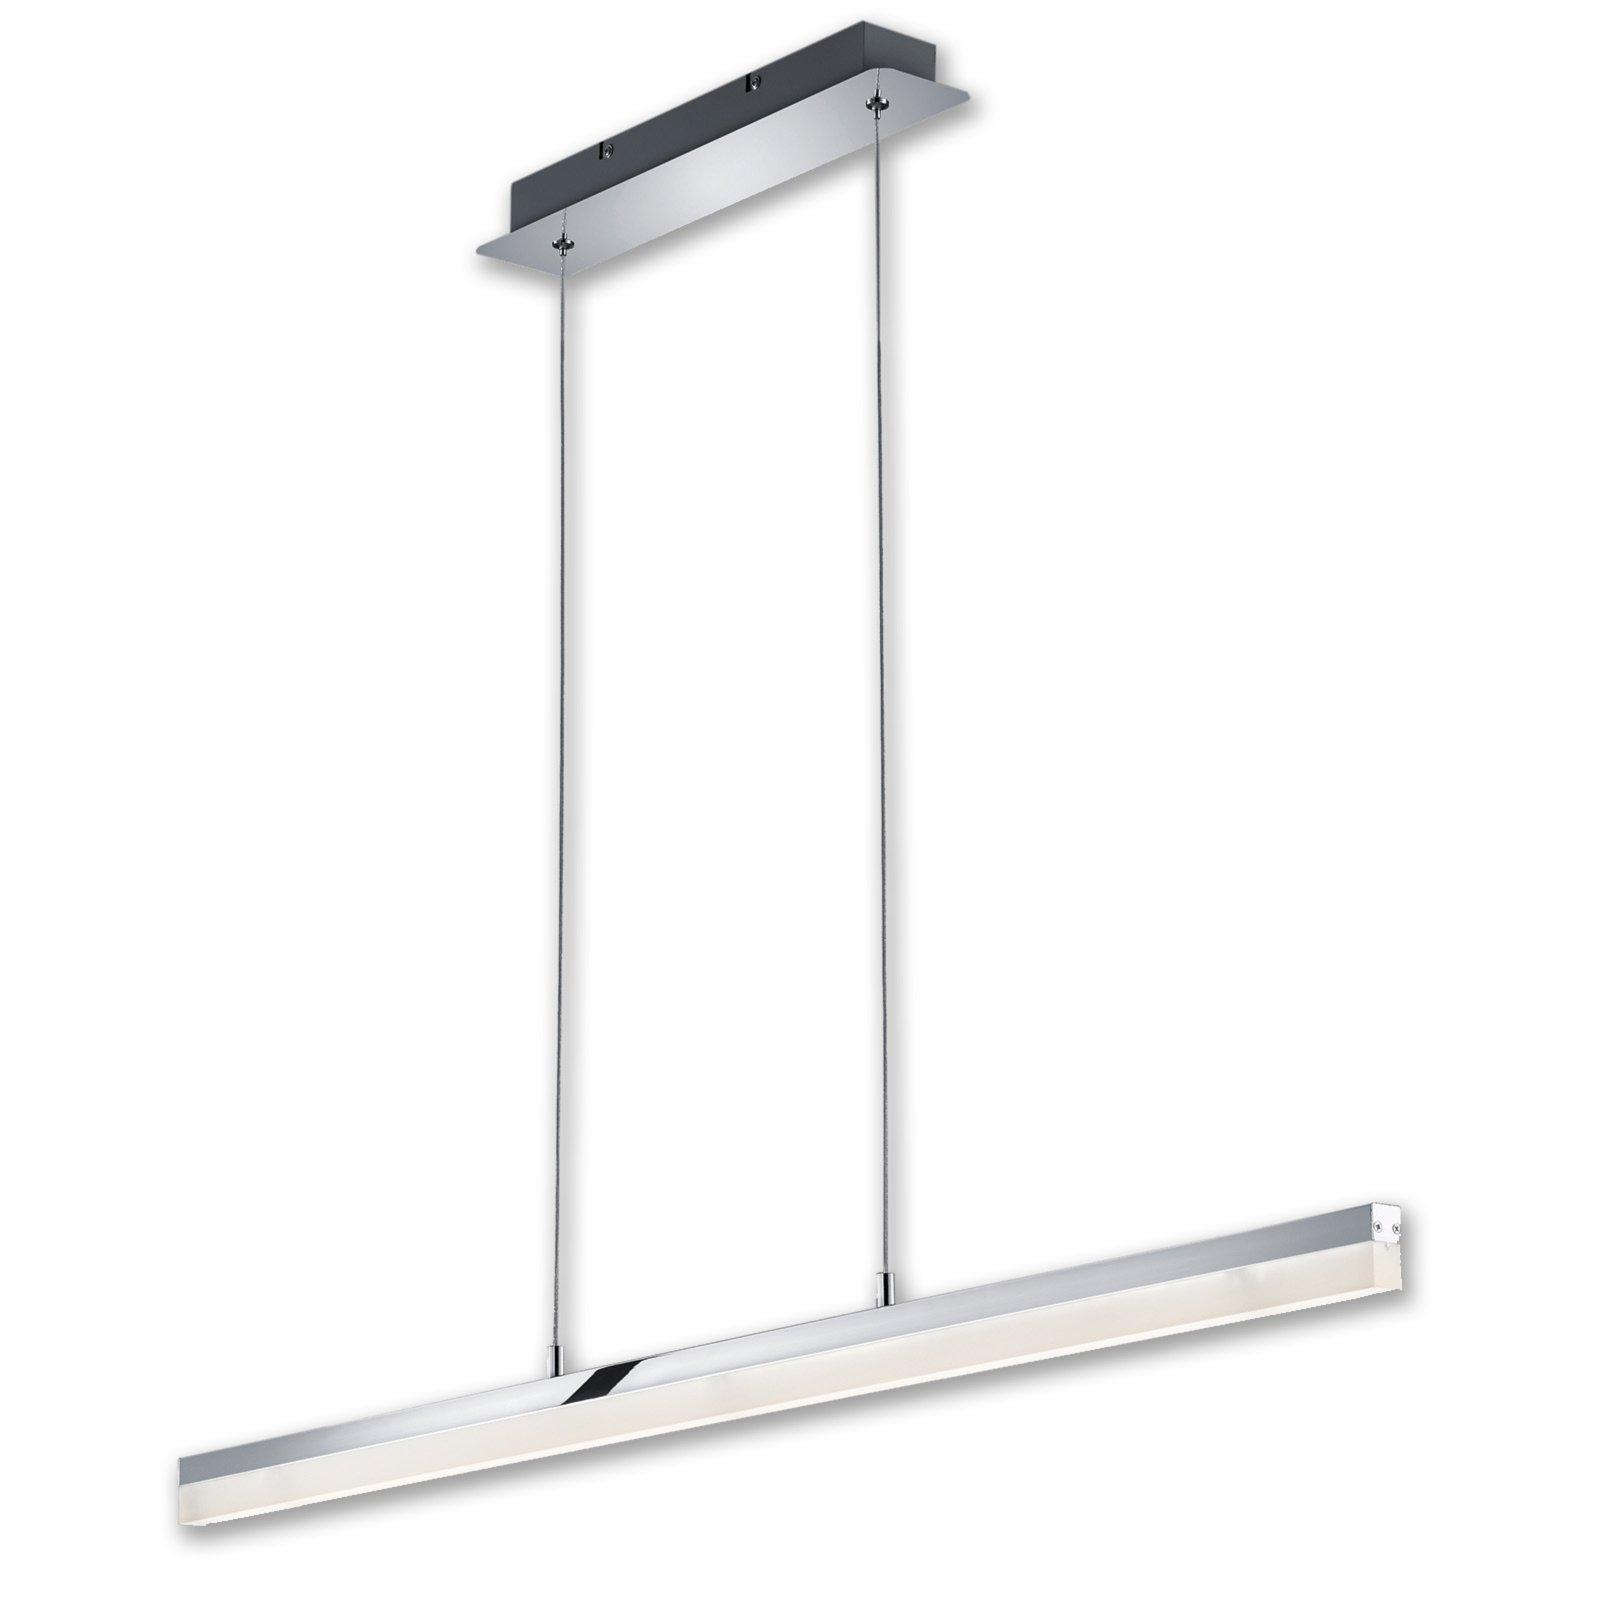 led pendelleuchte chrom metall pendelleuchten h ngelampen lampen m belhaus roller. Black Bedroom Furniture Sets. Home Design Ideas